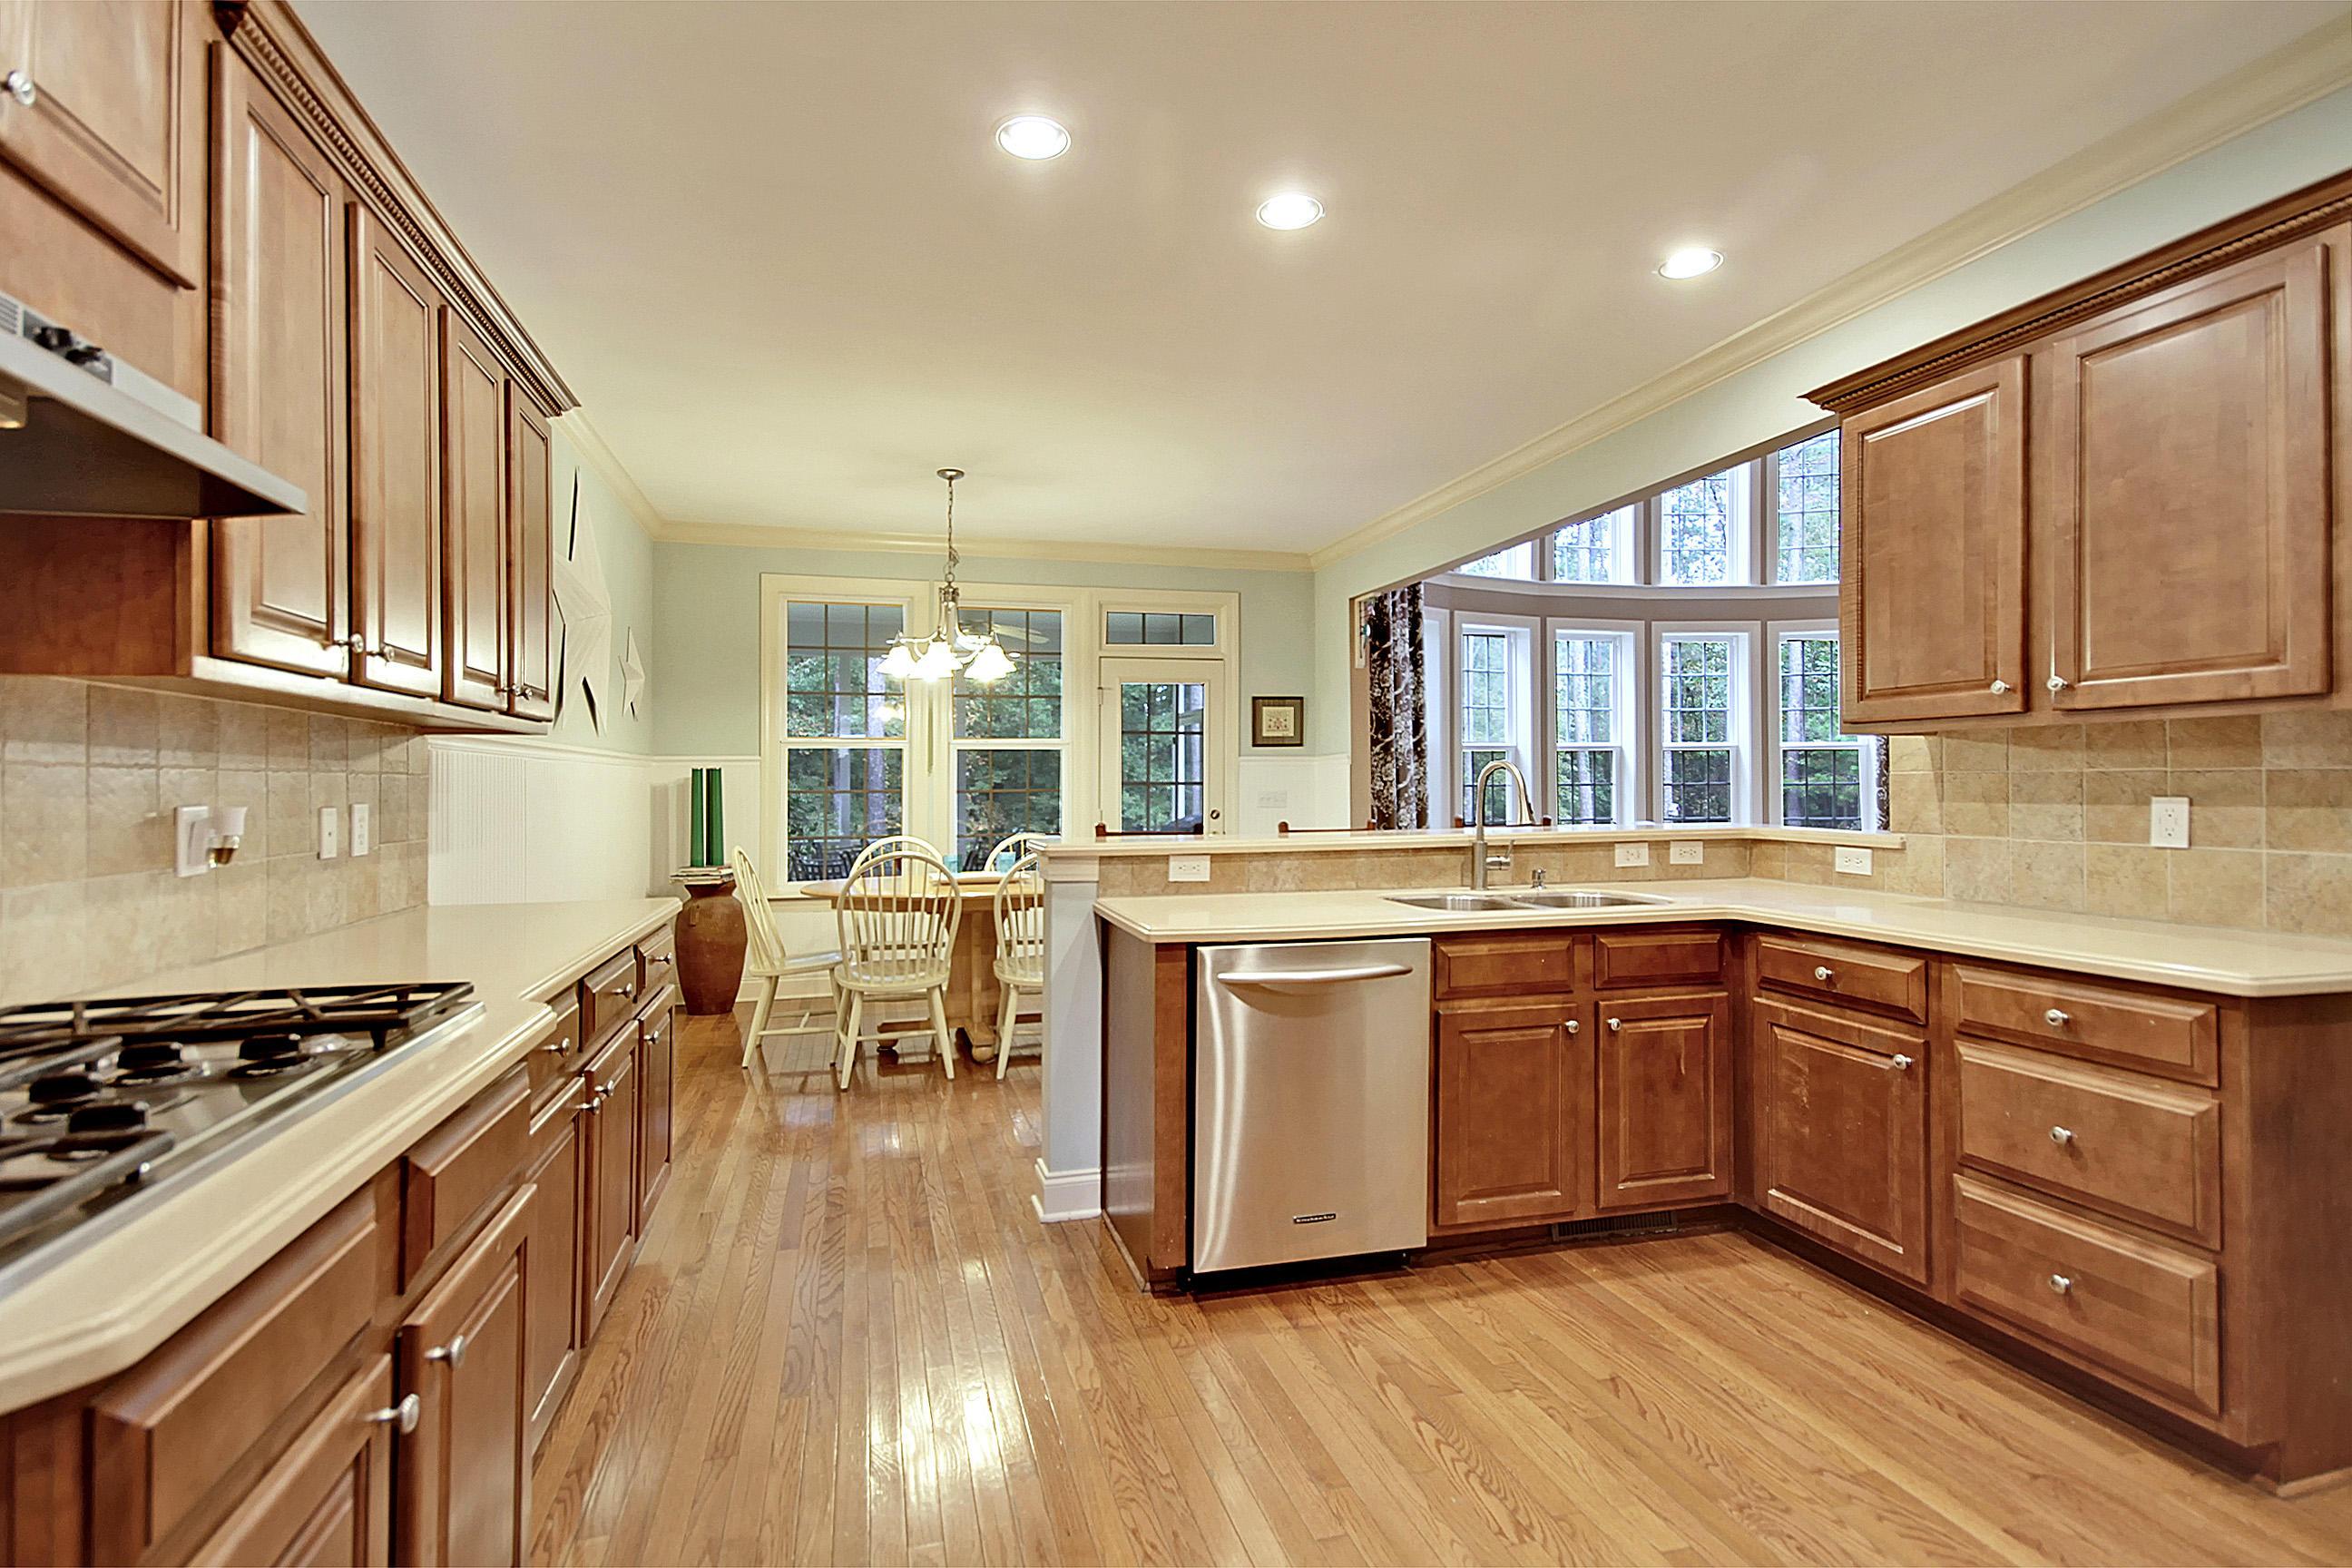 Dunes West Homes For Sale - 2449 Darts Cove, Mount Pleasant, SC - 52